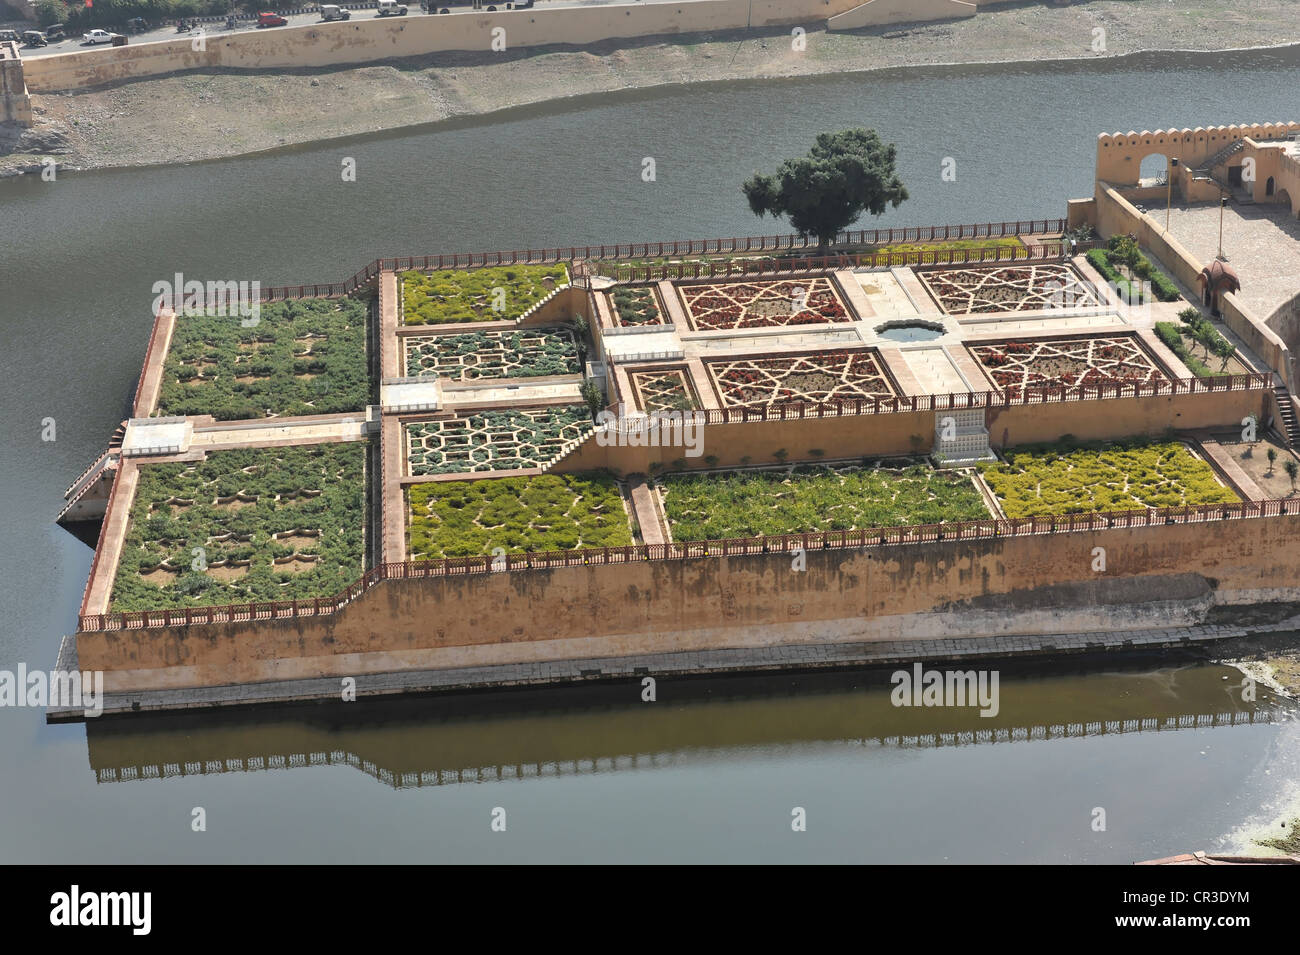 Kesar Kyari Bagh gardens, Amber Fort, Amber, near Jaipur, Rajasthan, North India, India, South Asia, Asia - Stock Image